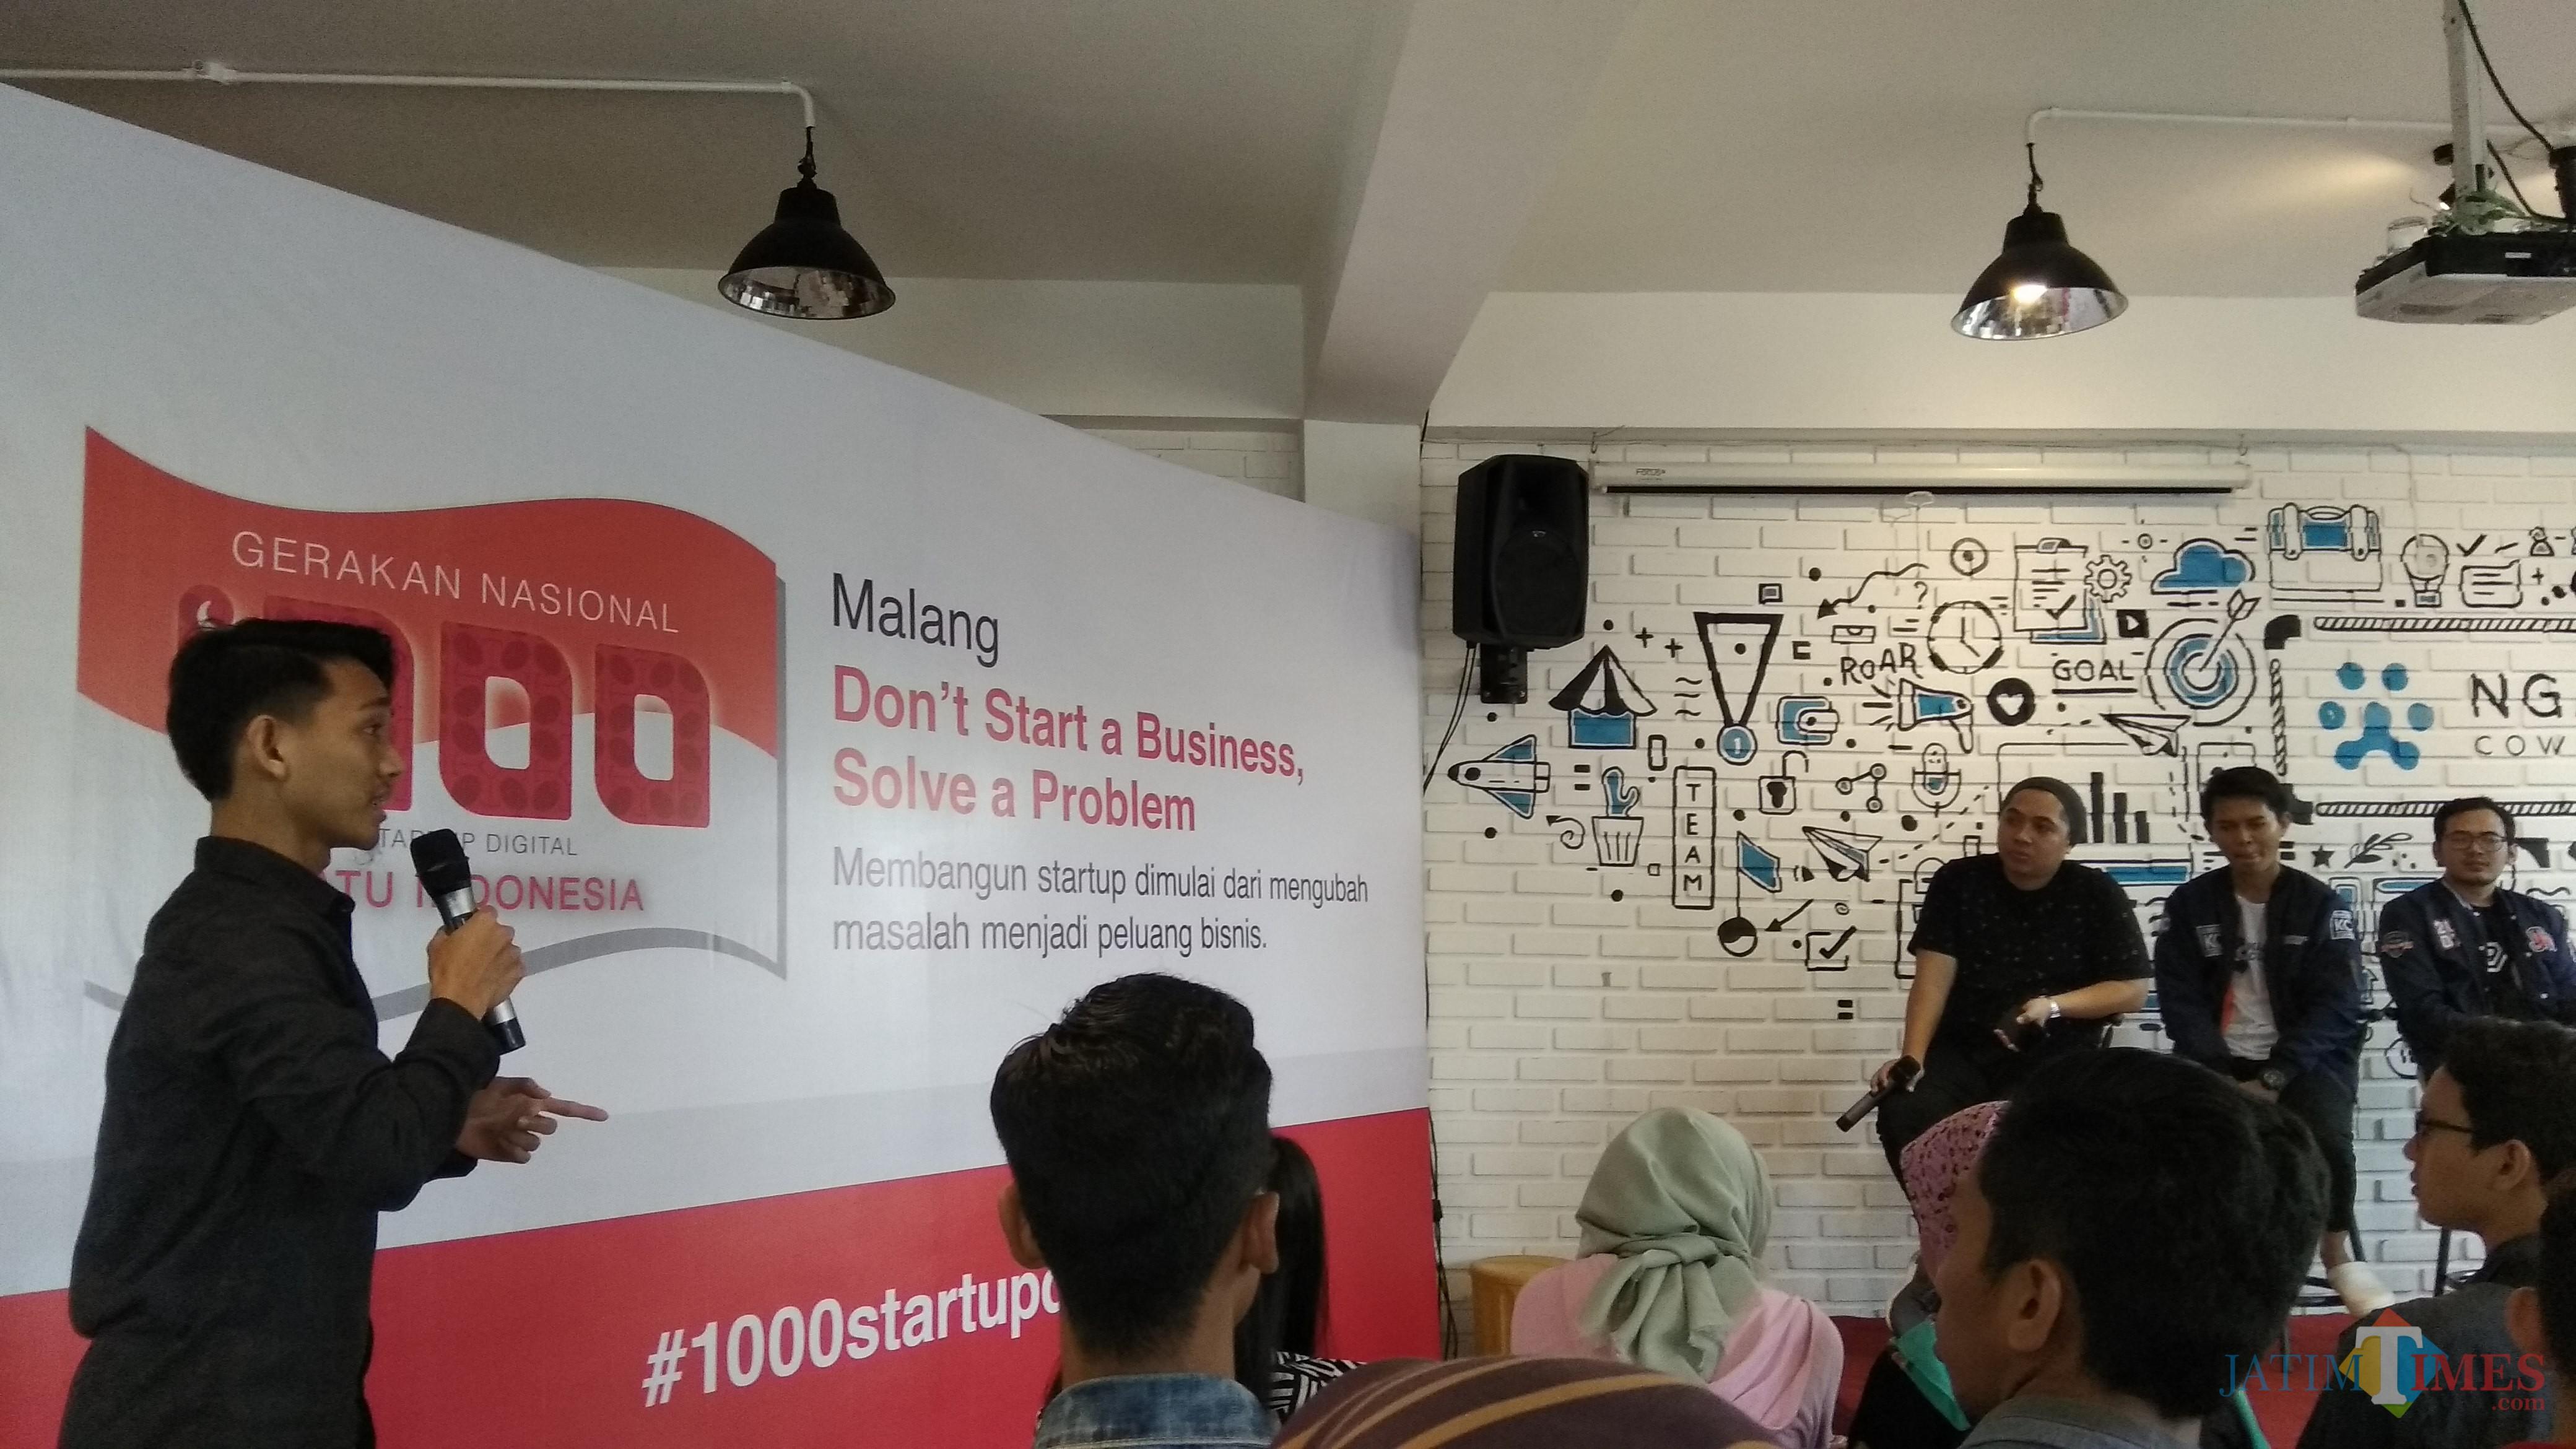 Roadshow Gerakan 1000 Startup Digital Malang di Ngalup Coworking Space. (Foto: Nurlayla Ratri/MalangTIMES)